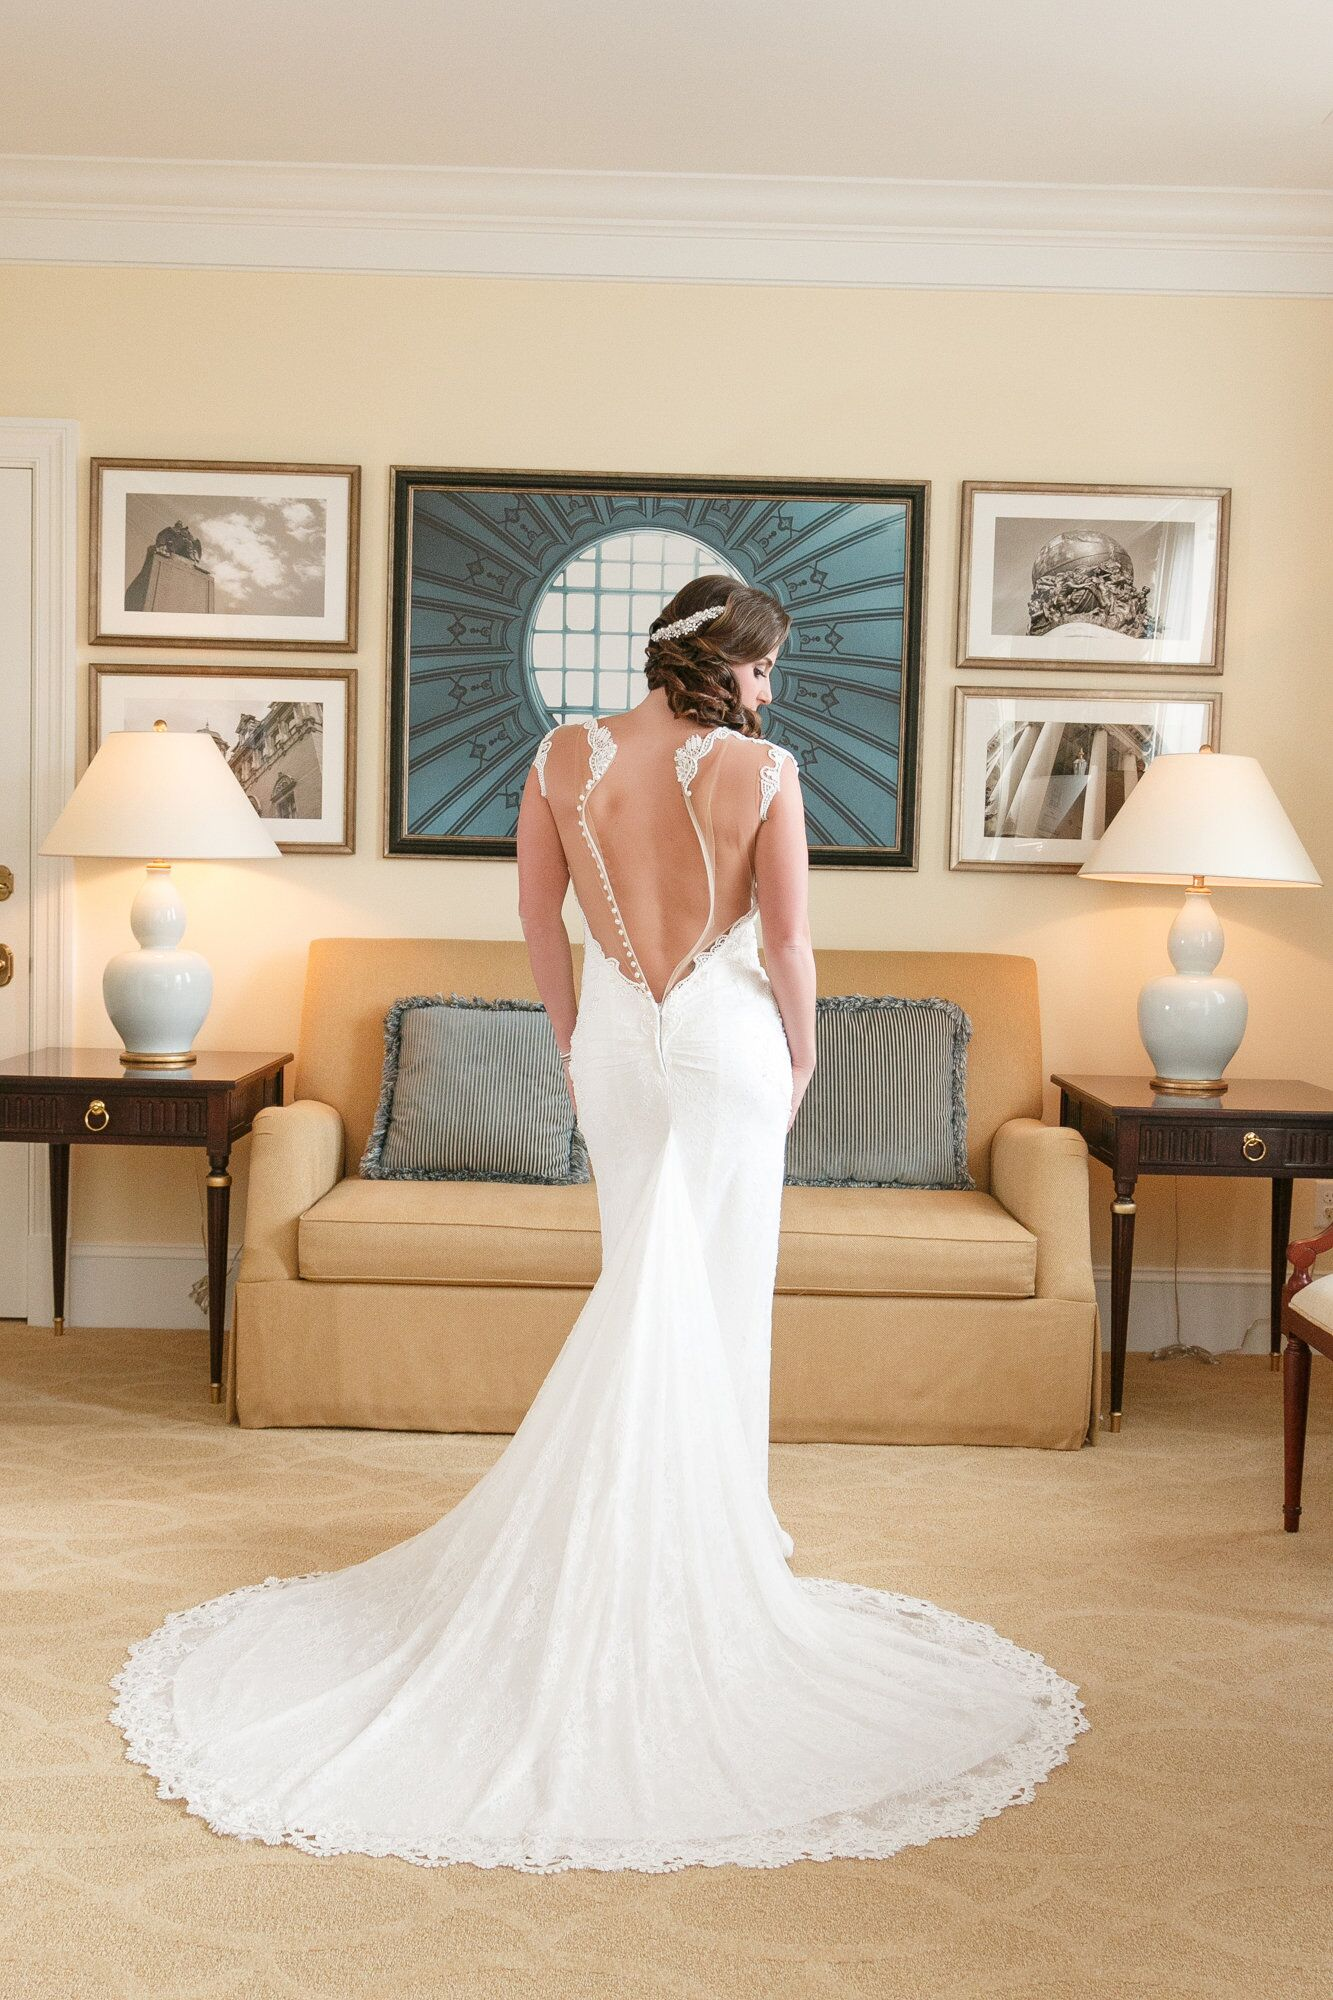 amandas wedding dress from behind